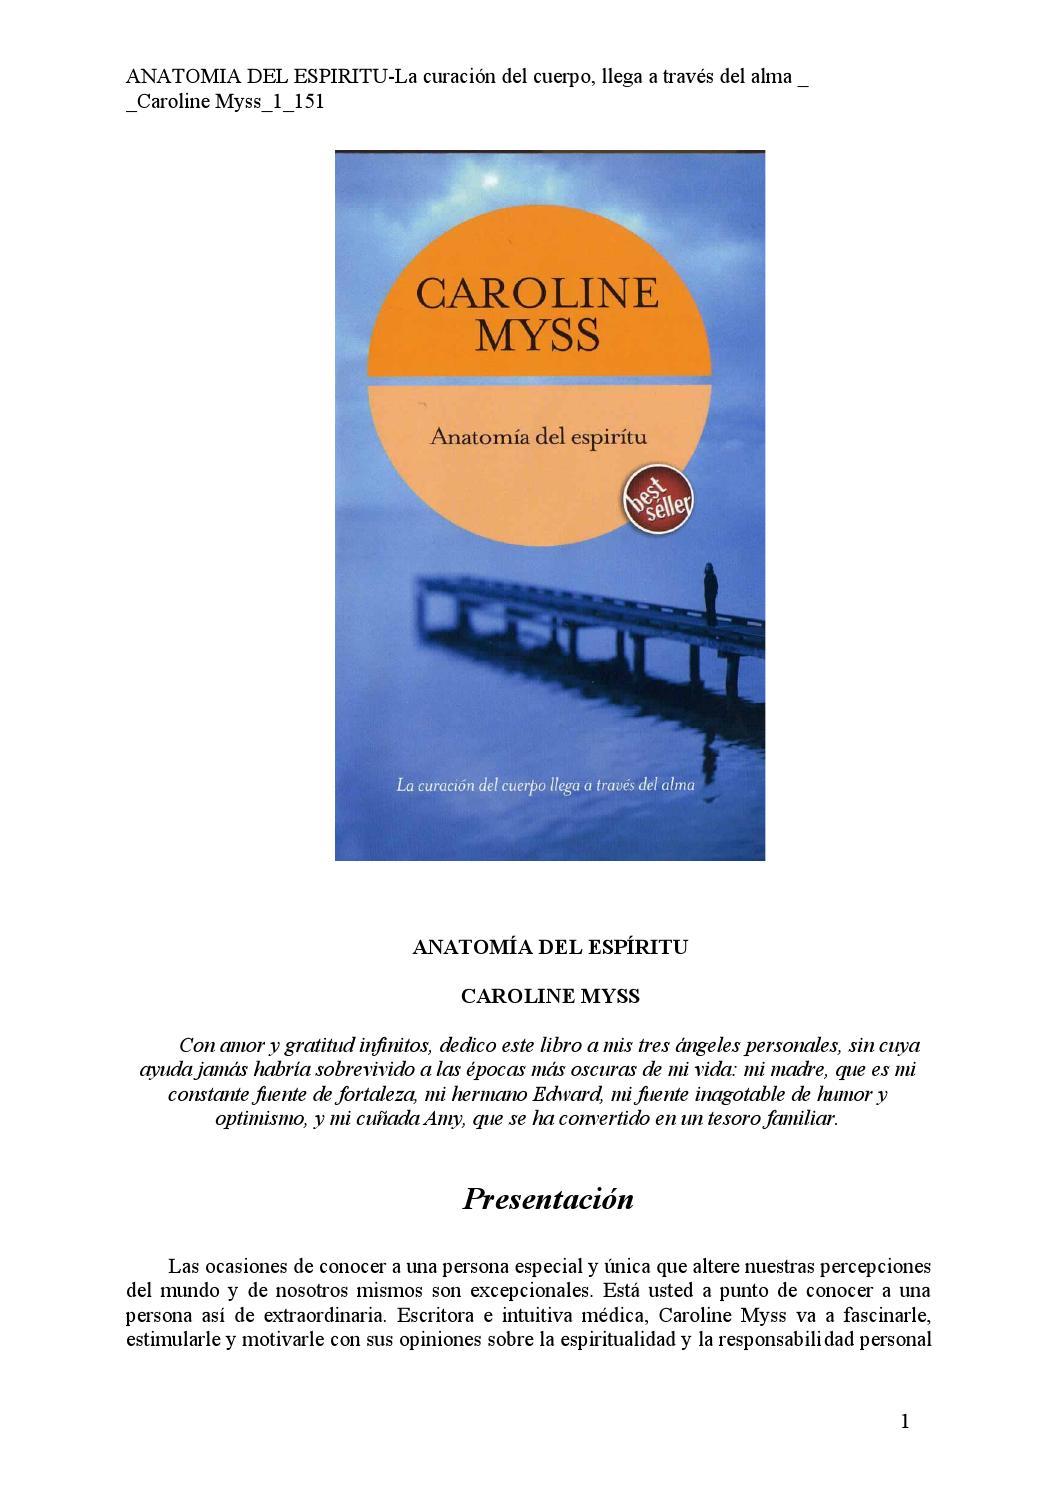 Anatomia del espiritu caroline myss[1] by María Pinto - issuu